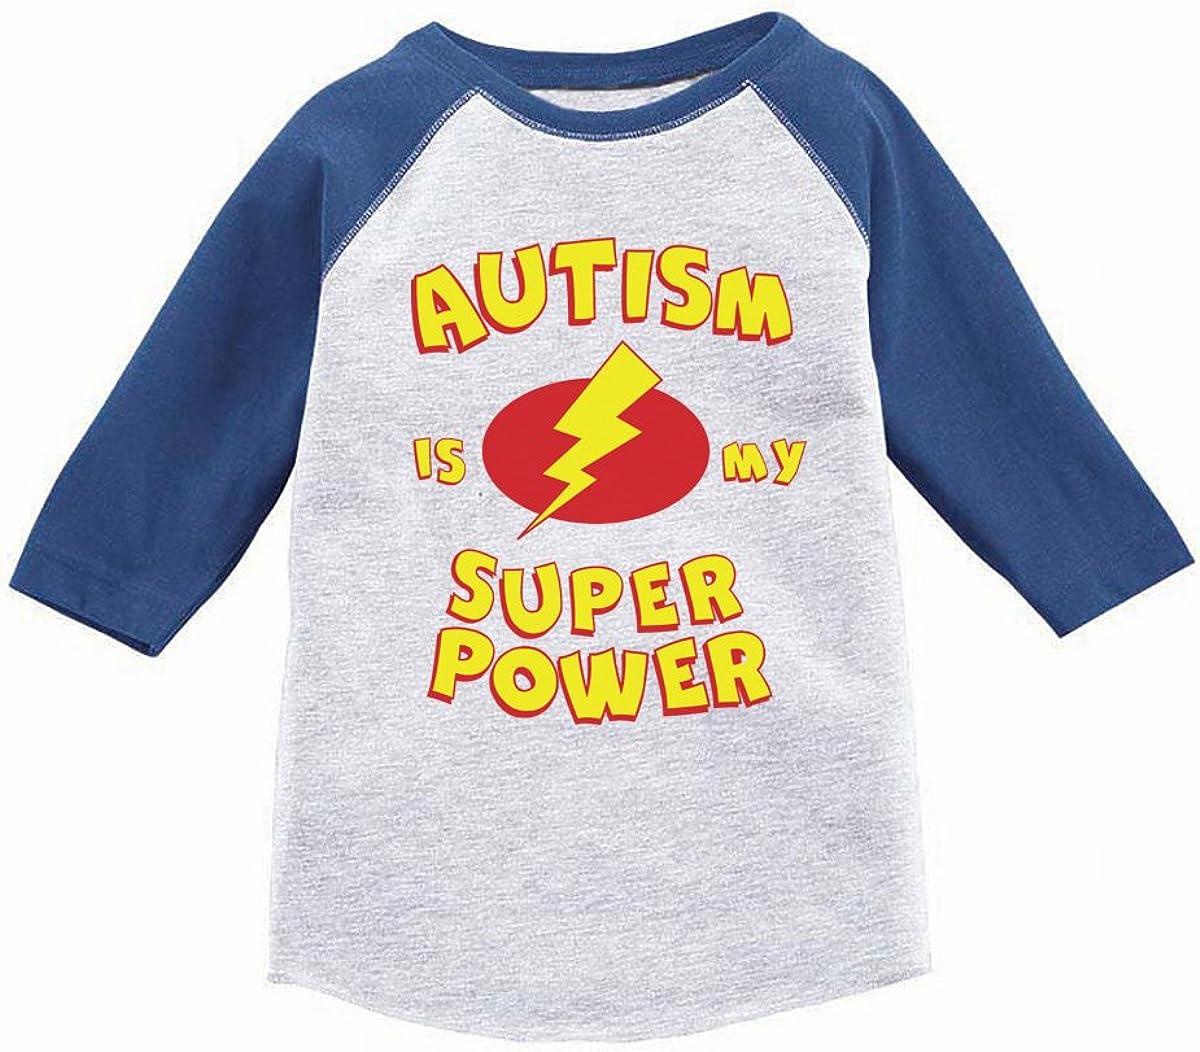 Awkward Styles Toddler Autism is My Super Power Shirt Girls Boys Autism Shirt